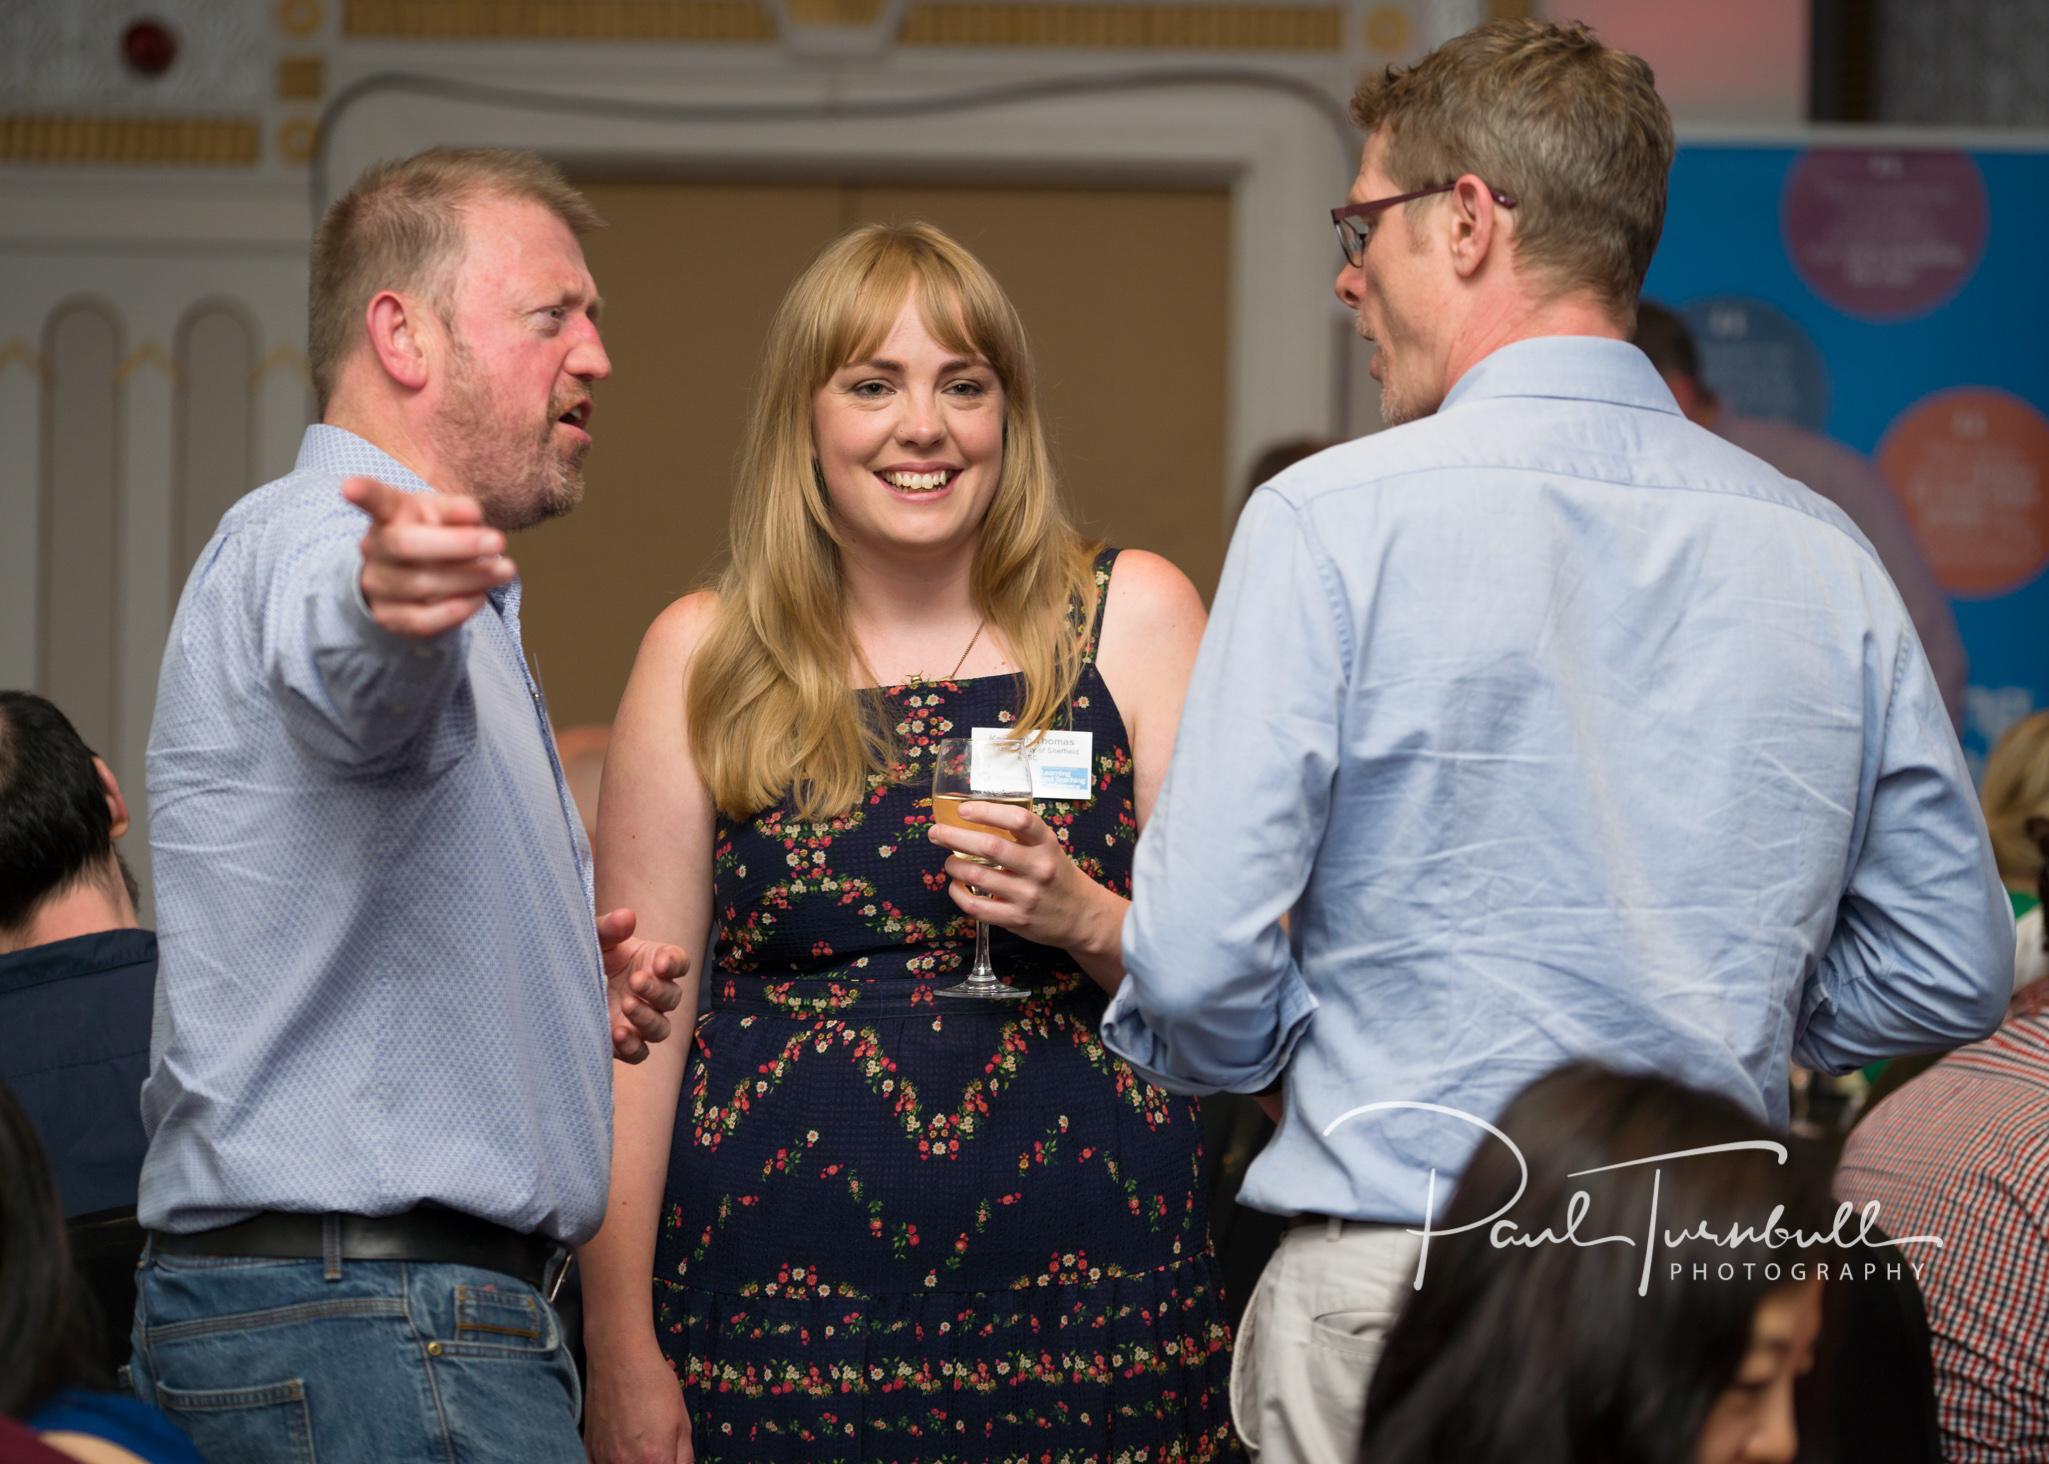 conference-event-photographer-queens-hotel-leeds-yorkshire-025.jpg